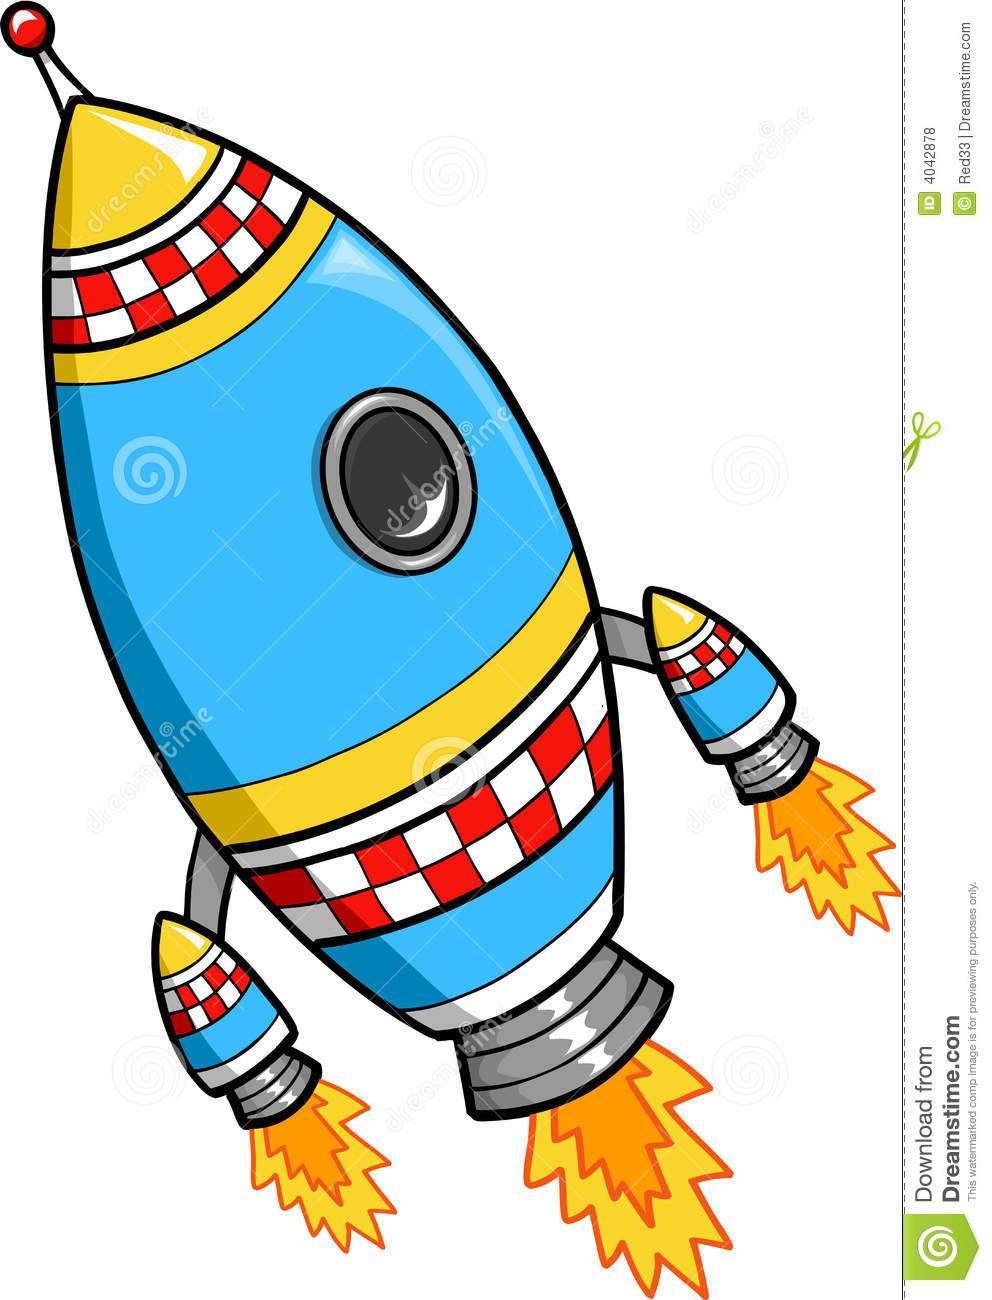 Rakete clipart banner free library Rakete clipart kostenlos 1 » Clipart Portal banner free library